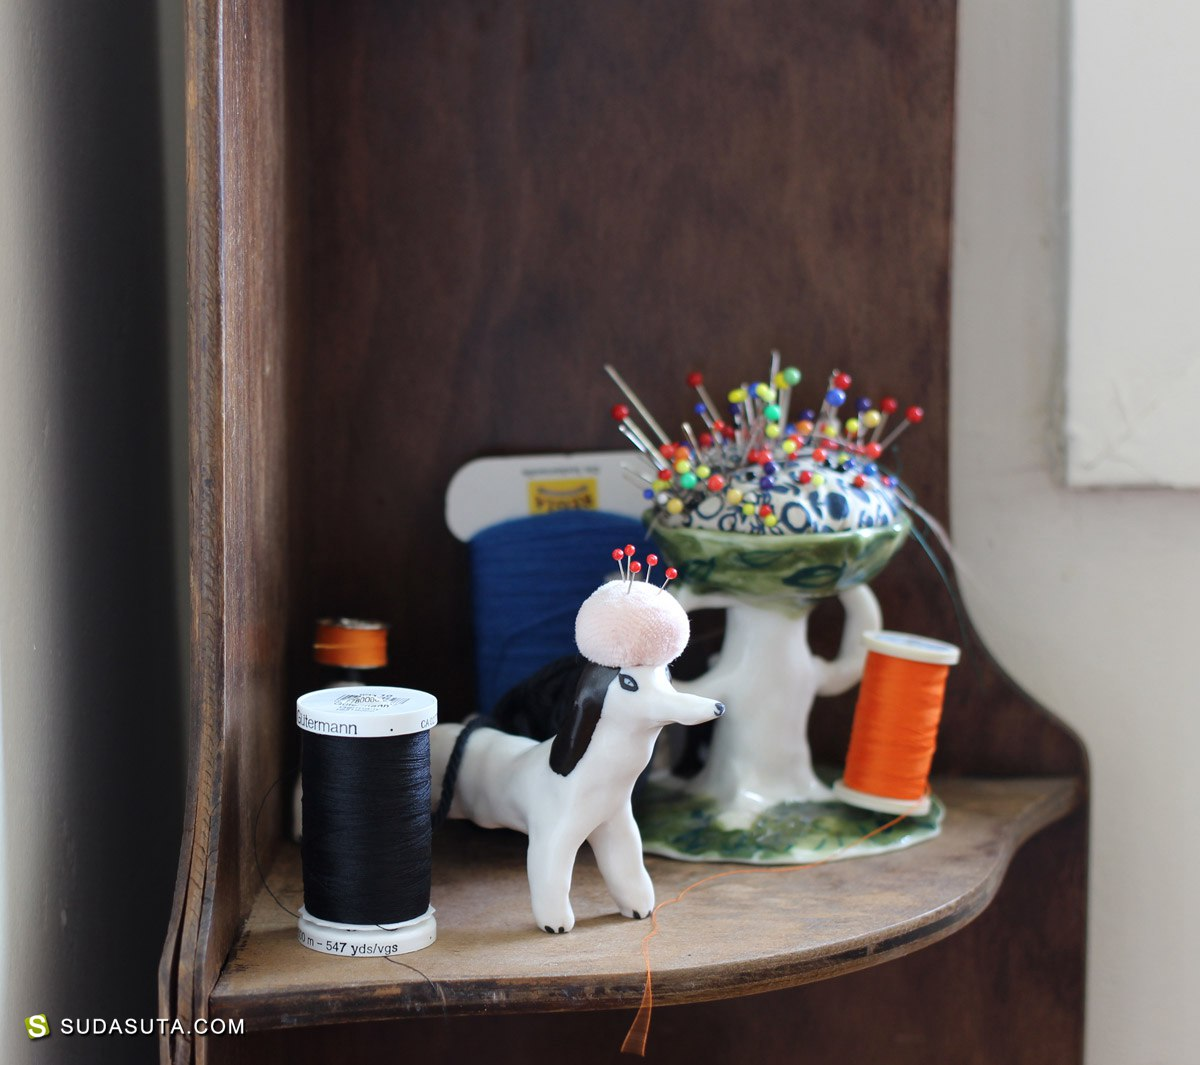 Eleonor Boström 呆萌有趣的陶瓷物件